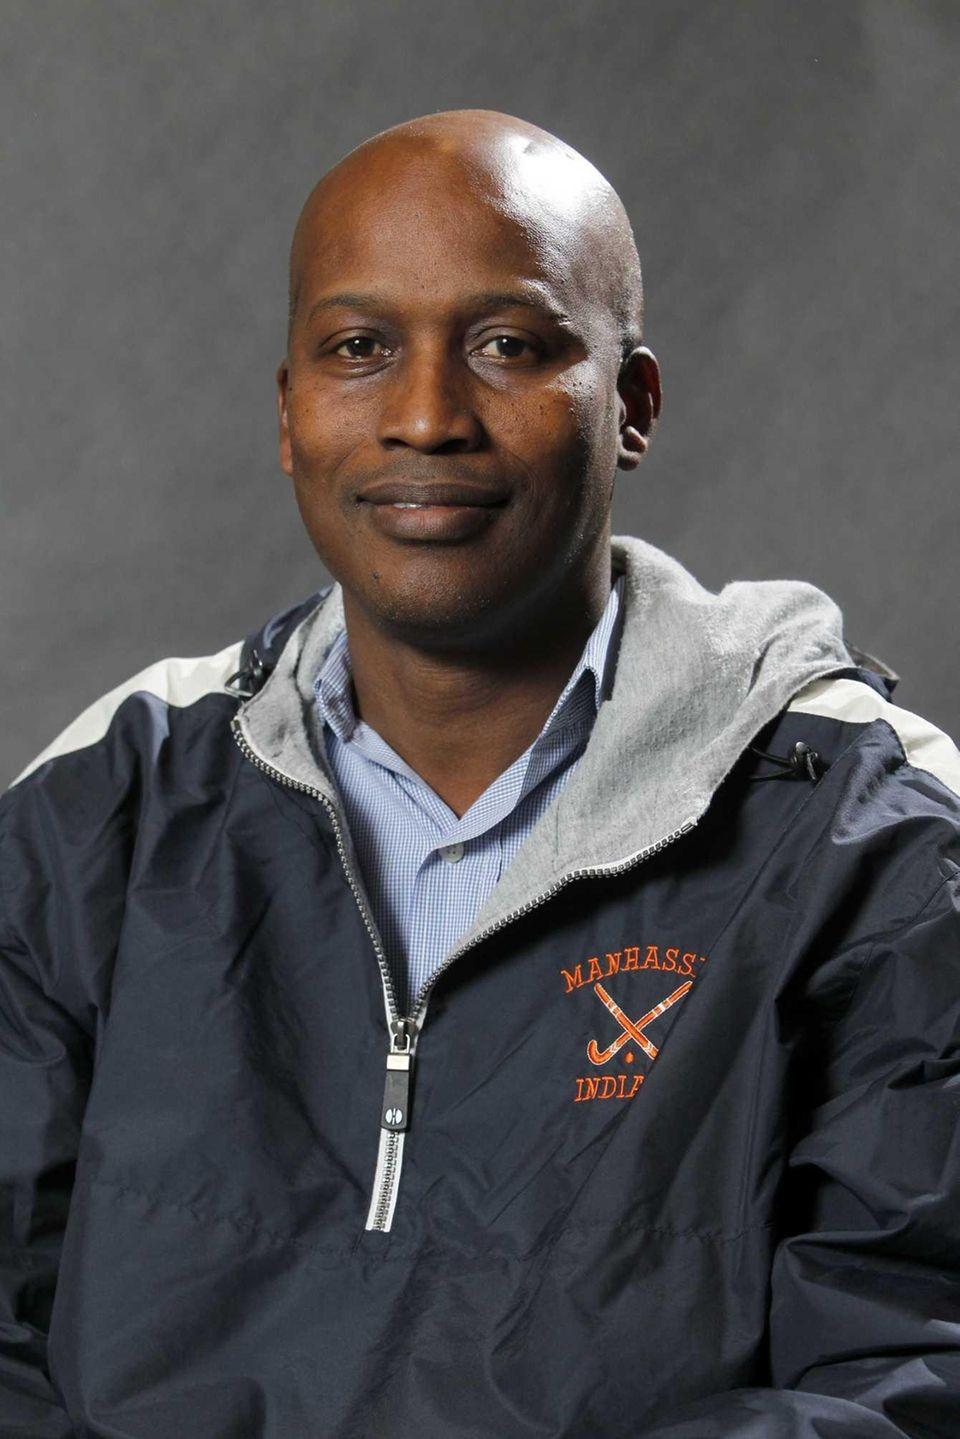 STEVE SPROUL Manhasset Nassau field hockey coach of